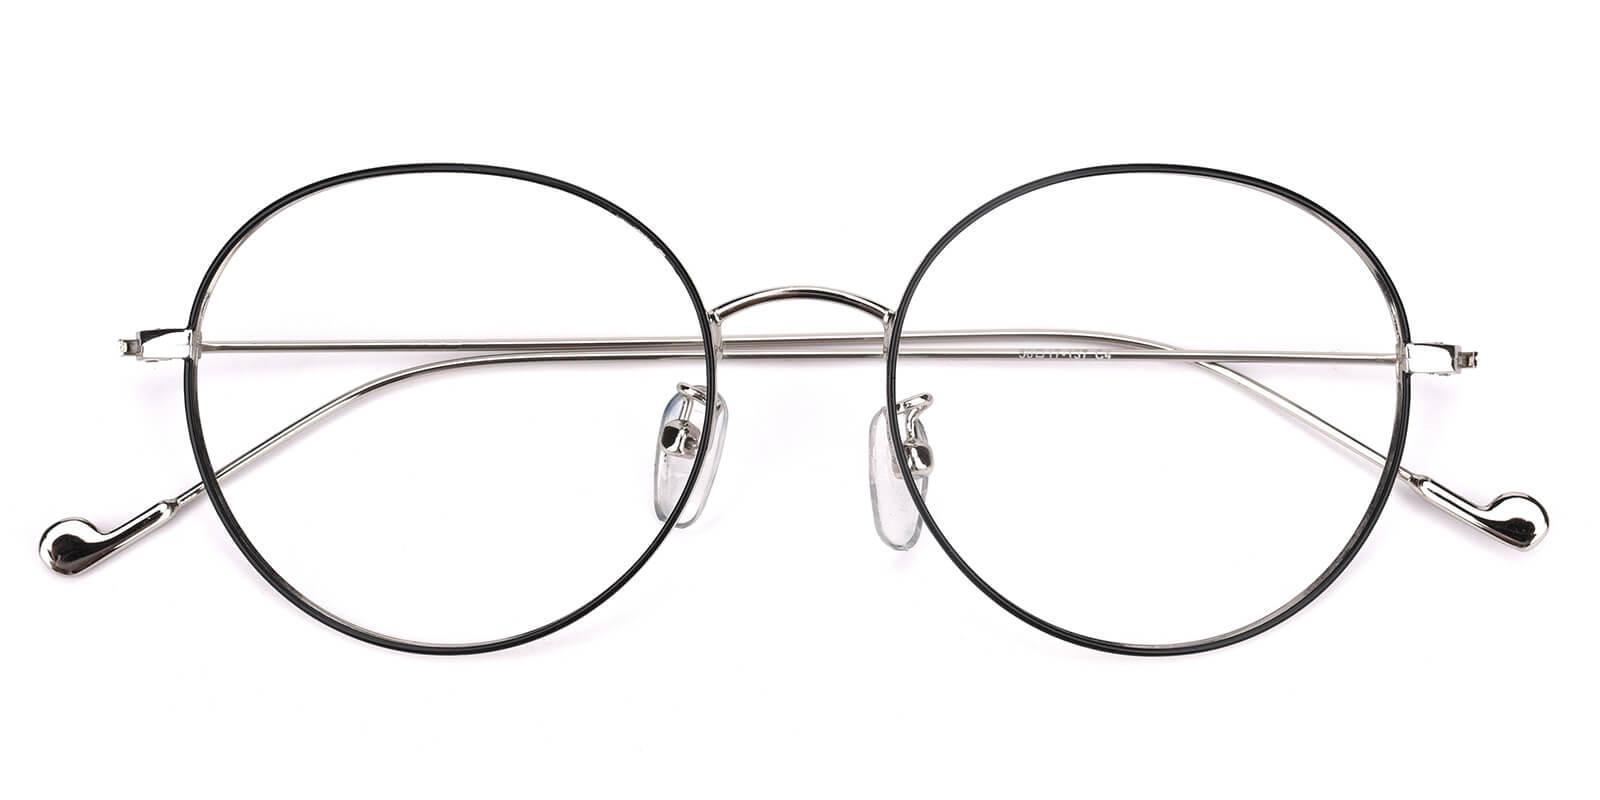 Jessy-Black-Round-Metal-Eyeglasses-detail